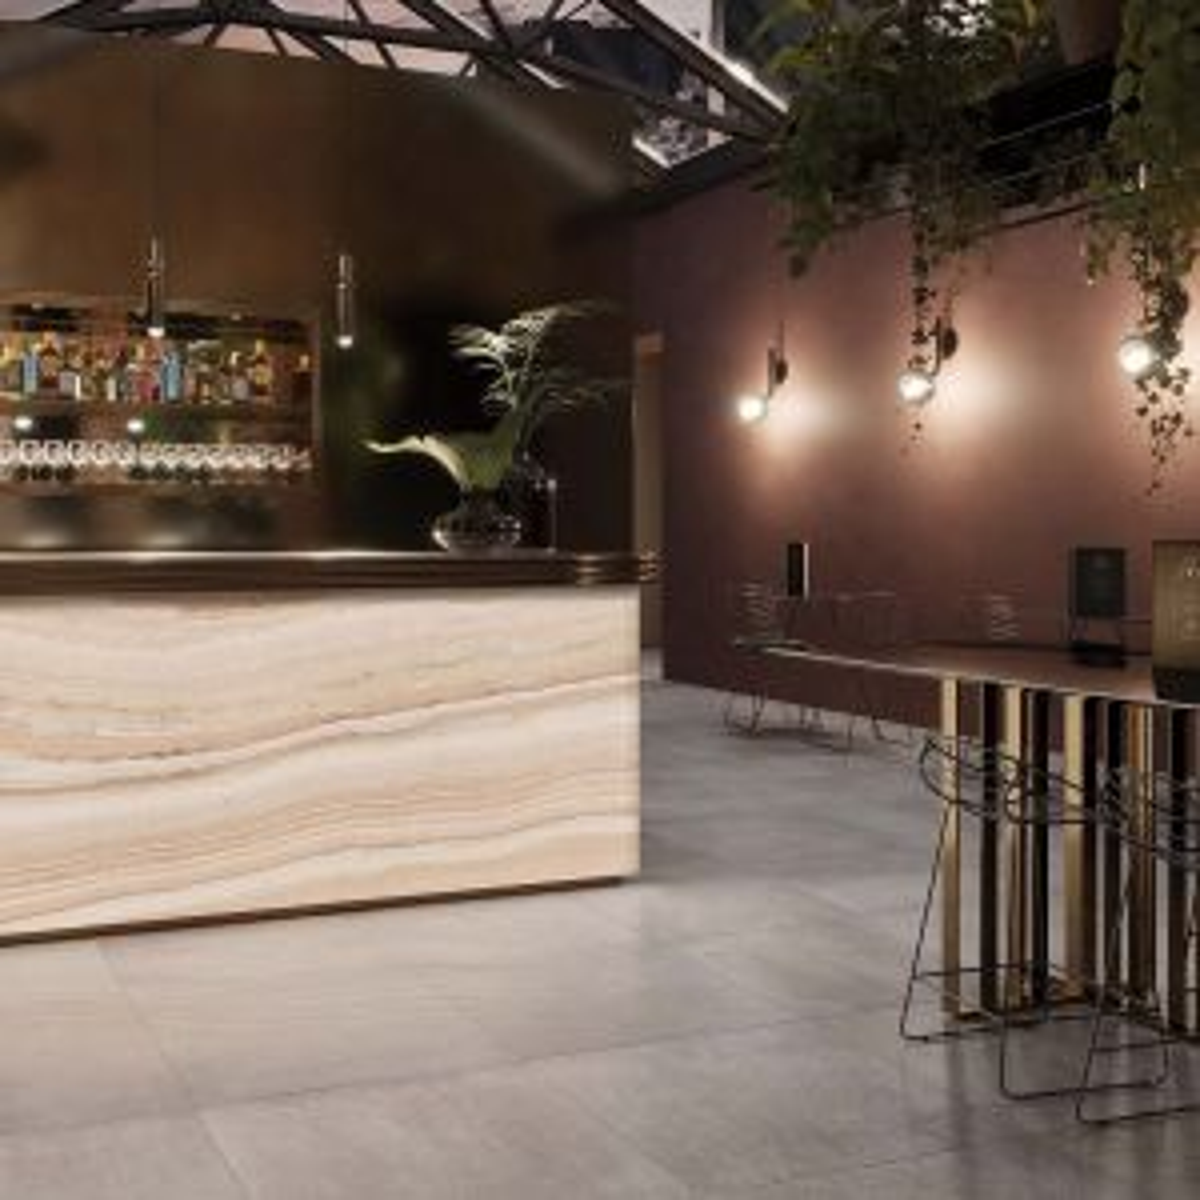 RAK Luce Translucent Onyx Harlequin Full Lappato Tile 1200 x 2600mm Lifestyle